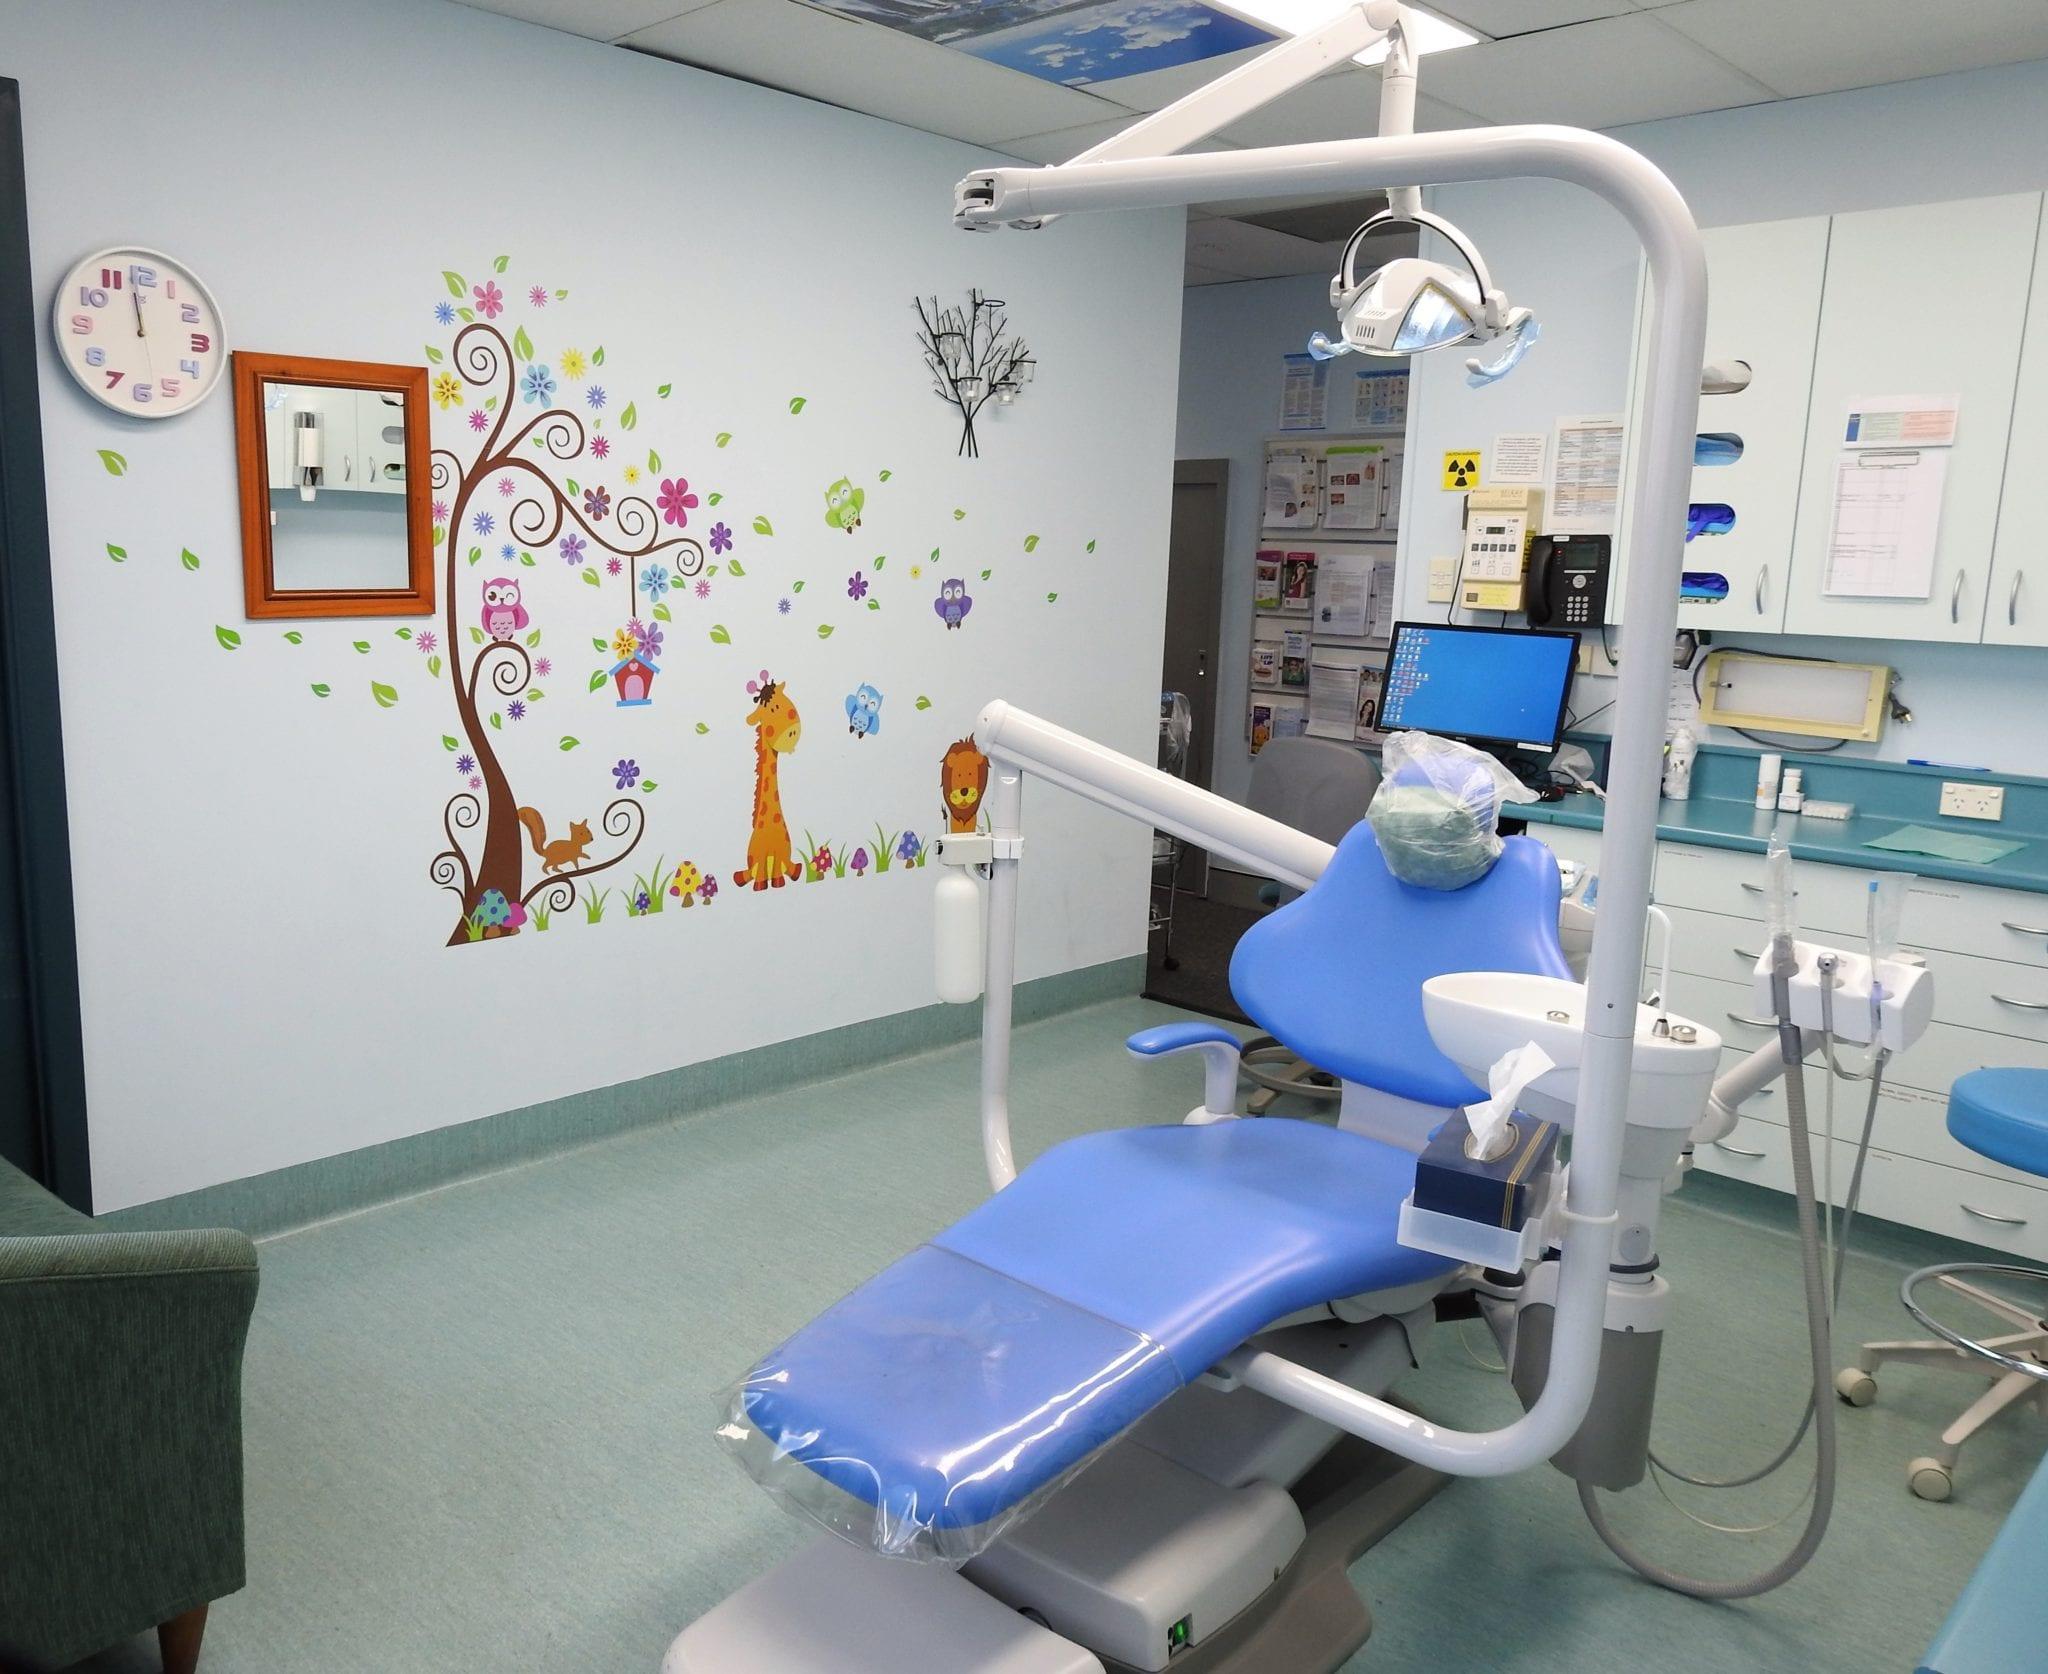 Campbelltown Family Dental Care Surgery chair